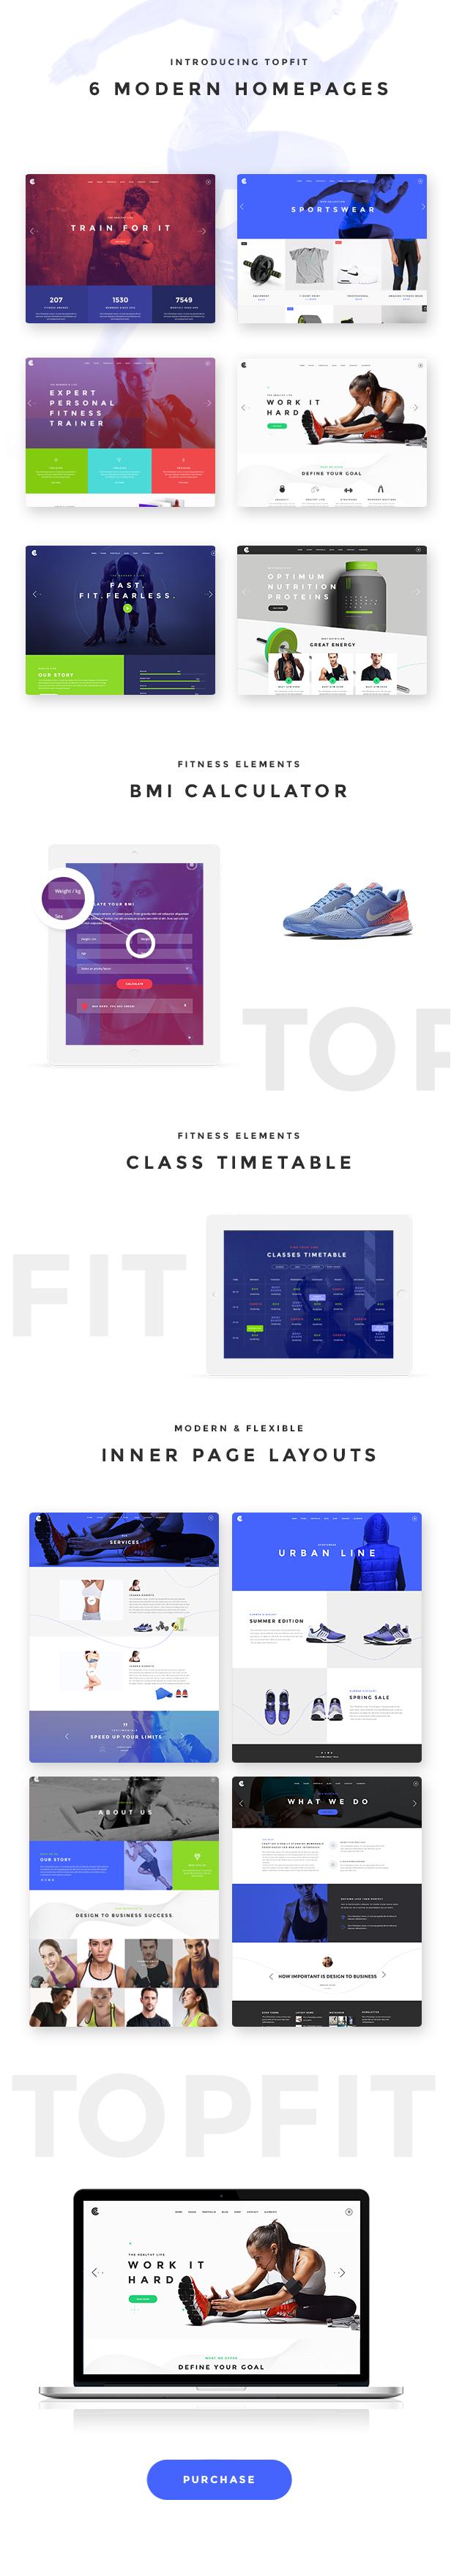 TopFit - Fitness and Gym Theme - 1